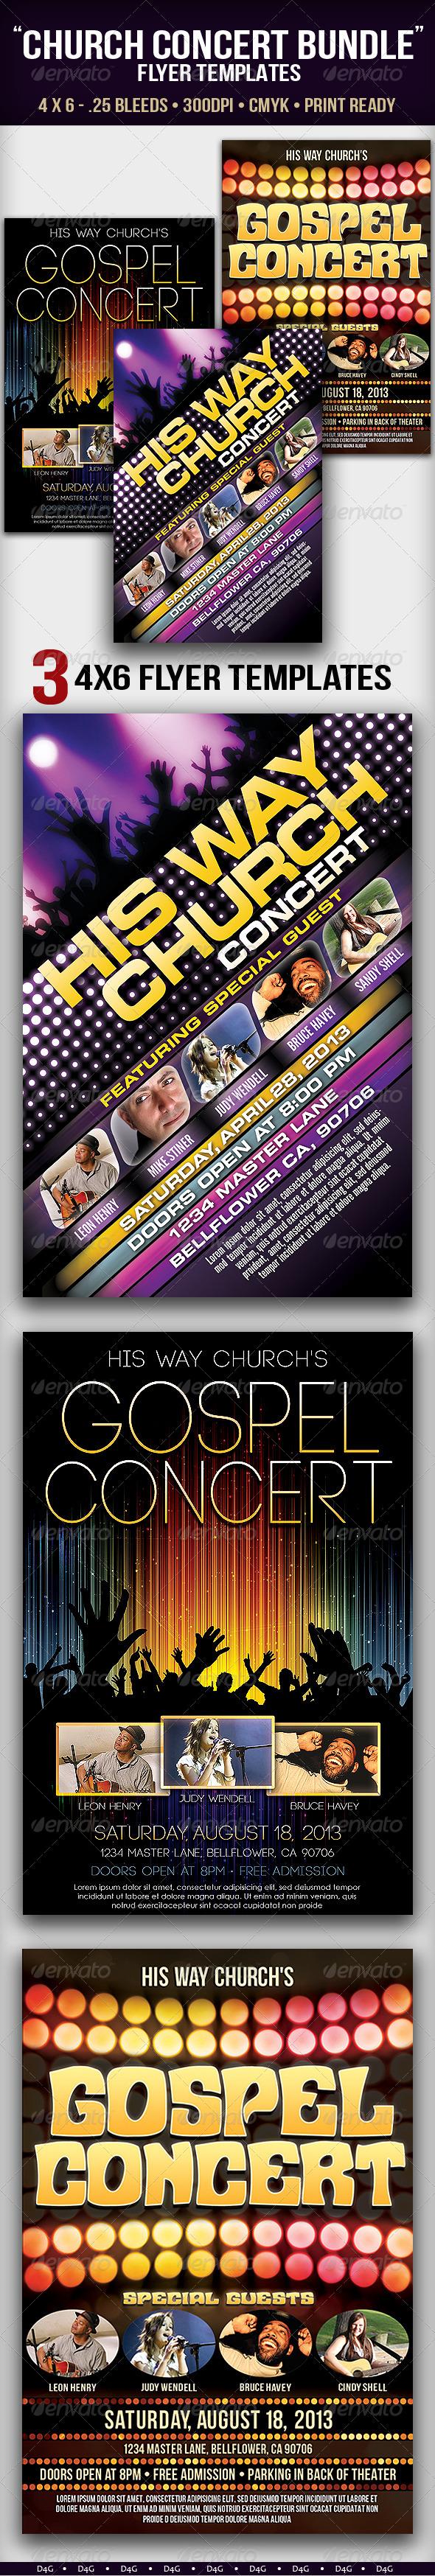 Church Concert Flyer Bundle - Church Flyers